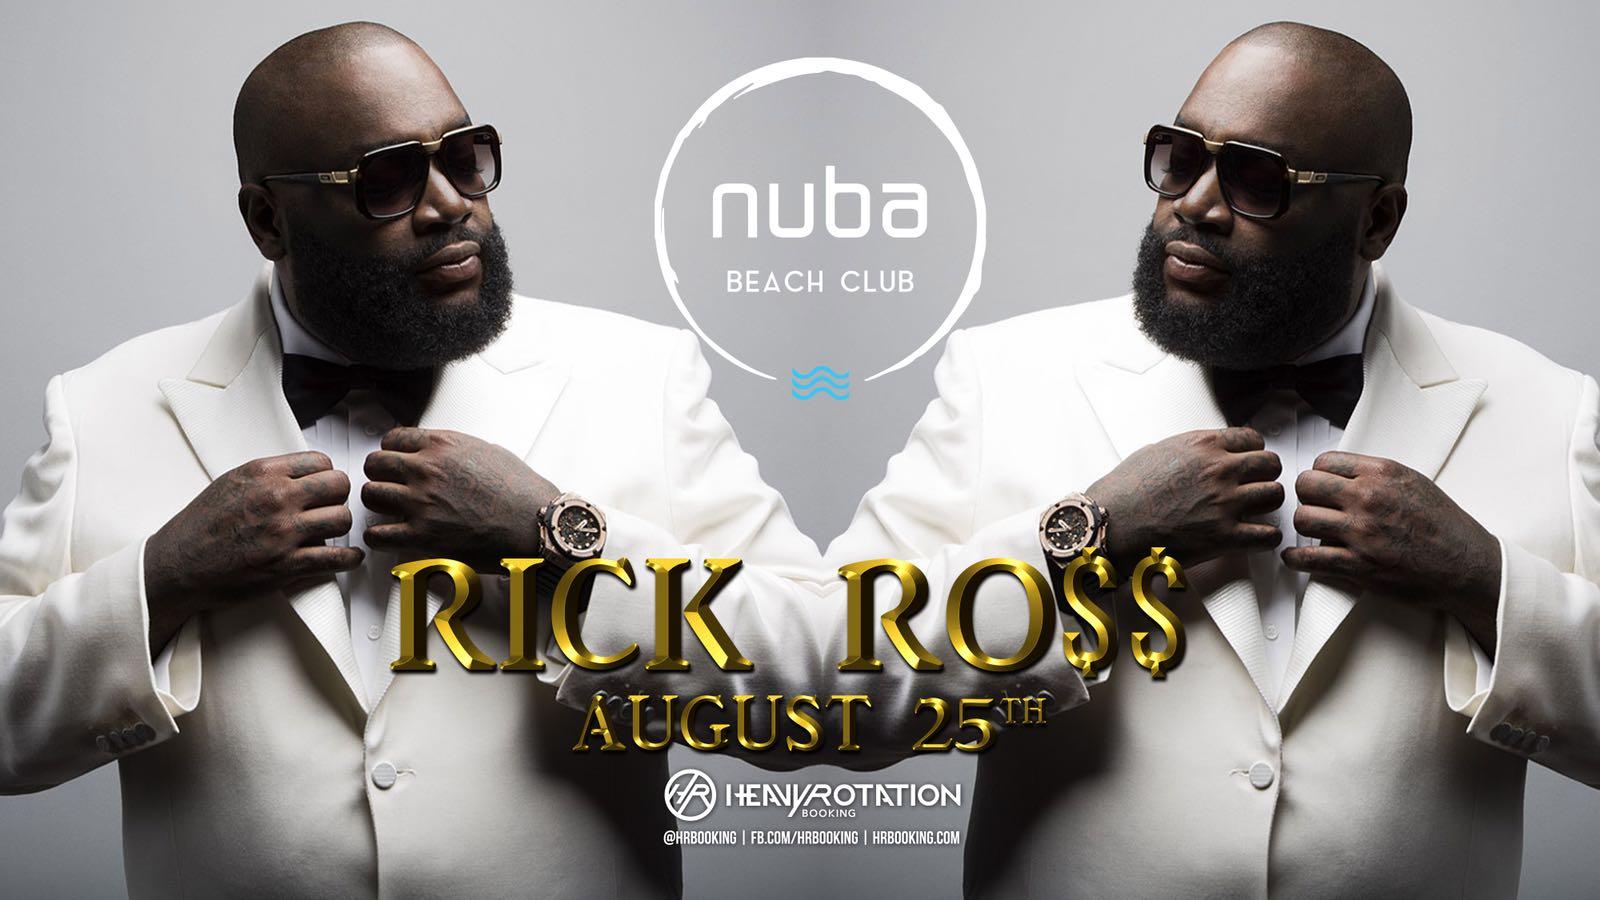 Rick Ross pe scena NUBA Beach Club